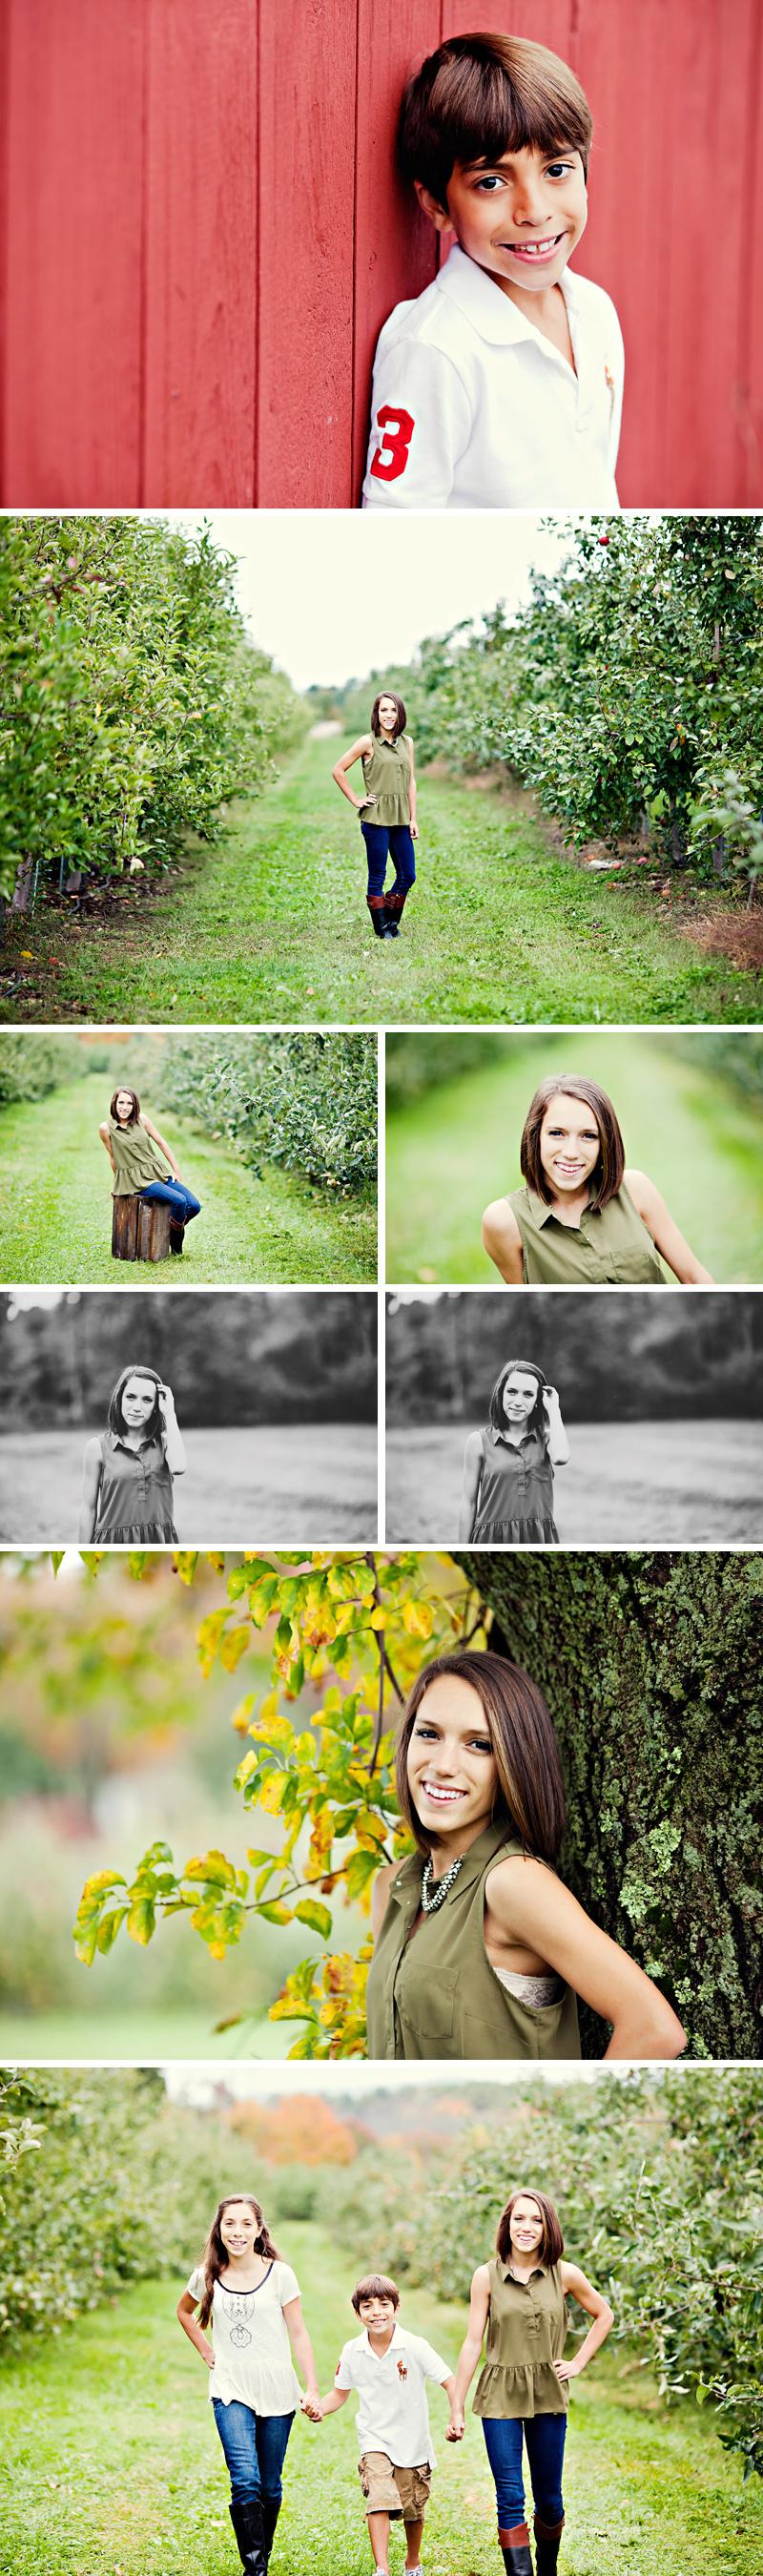 Massachusetts-Senior-Photographerc002